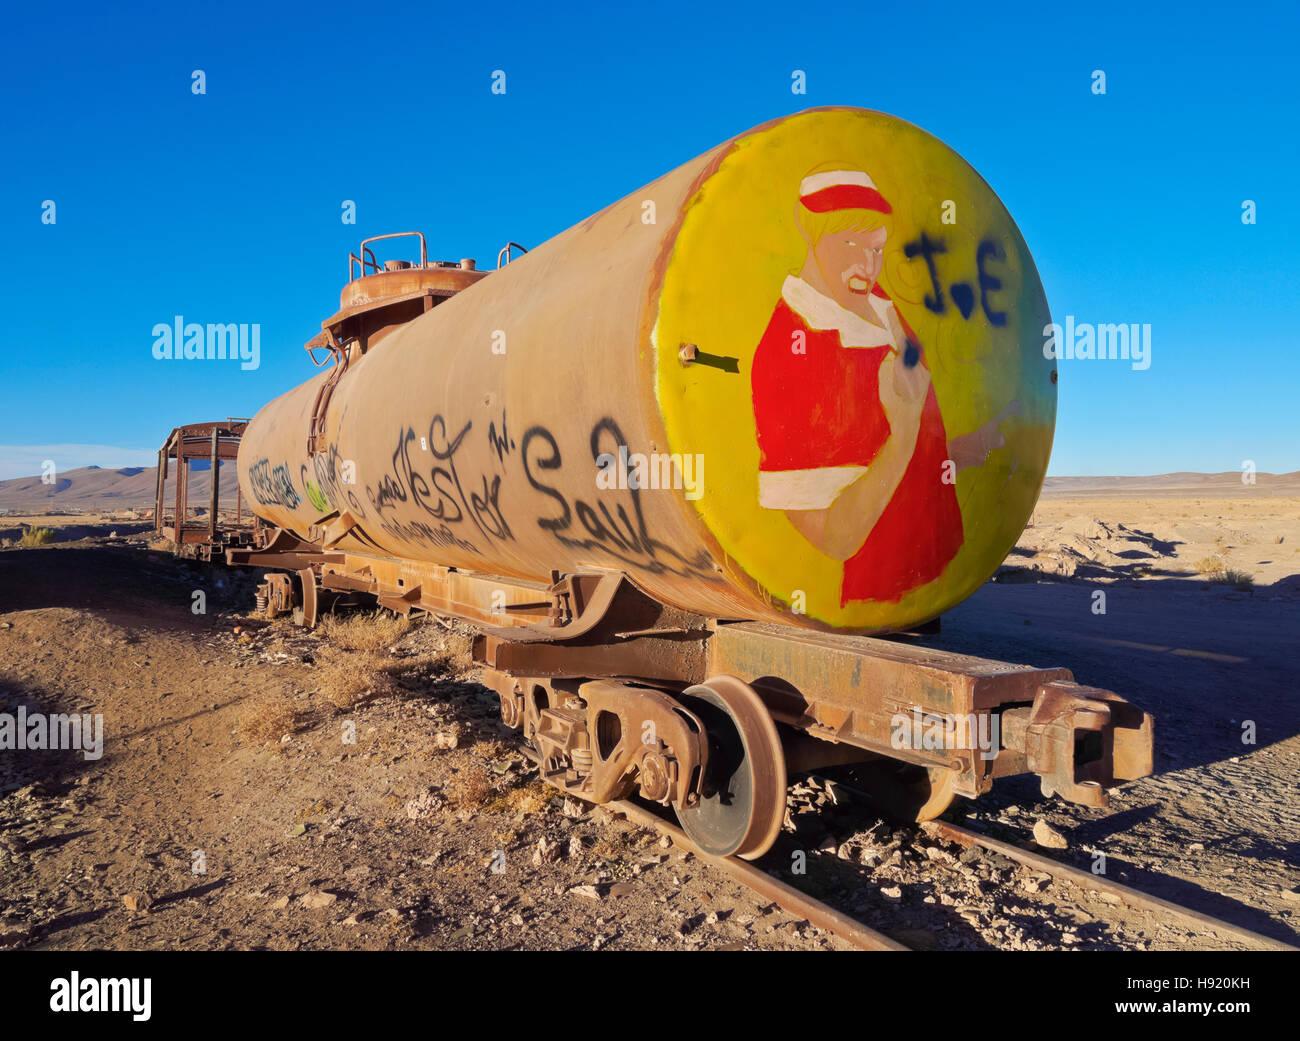 Bolivia, Potosi Department, Antonio Quijarro Province, Uyuni, View of the train cemetery. - Stock Image